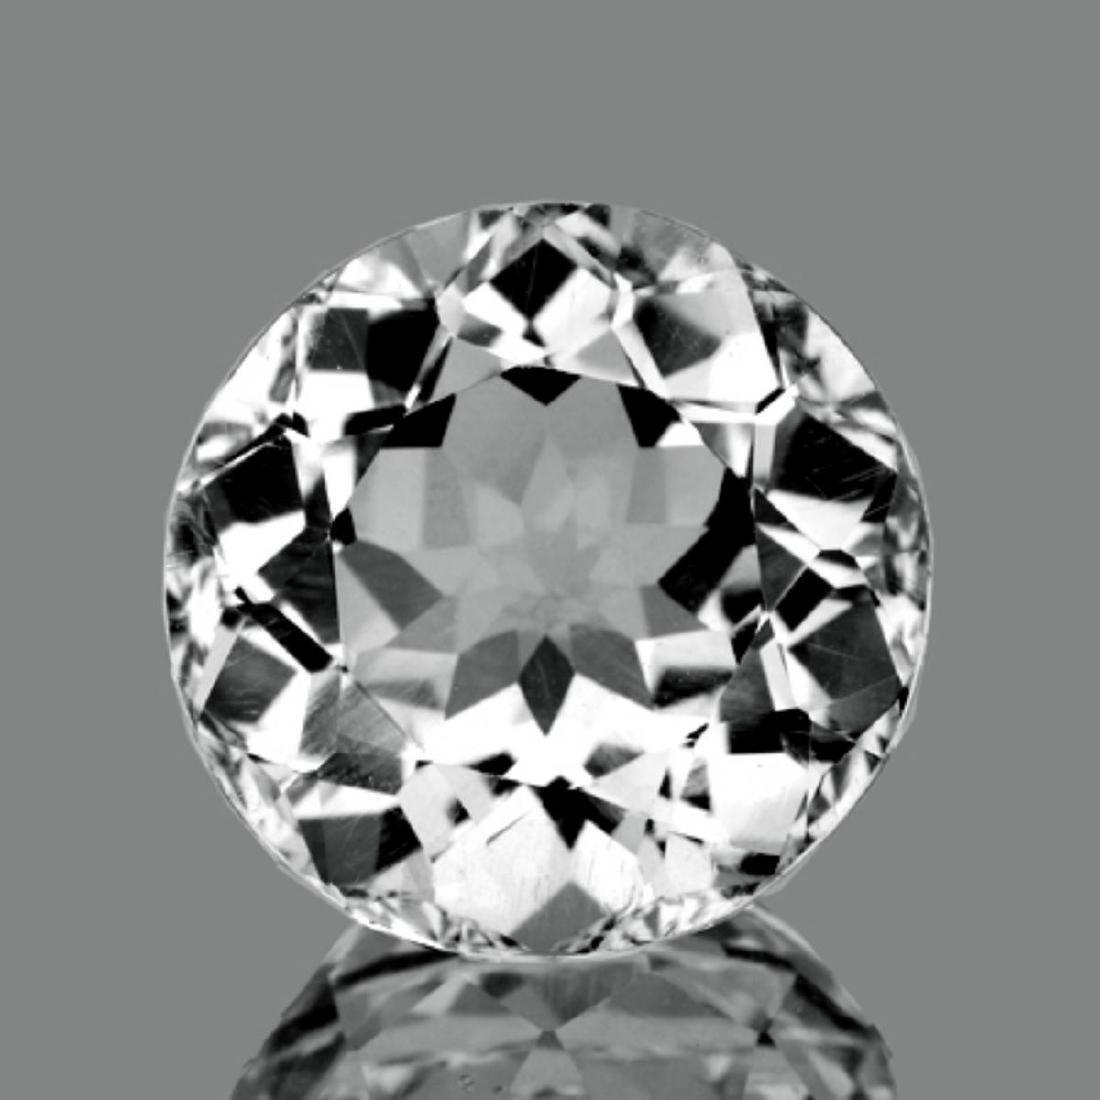 Natural Healing Colorless Quartz (Rock Crystal)18.10 Ct